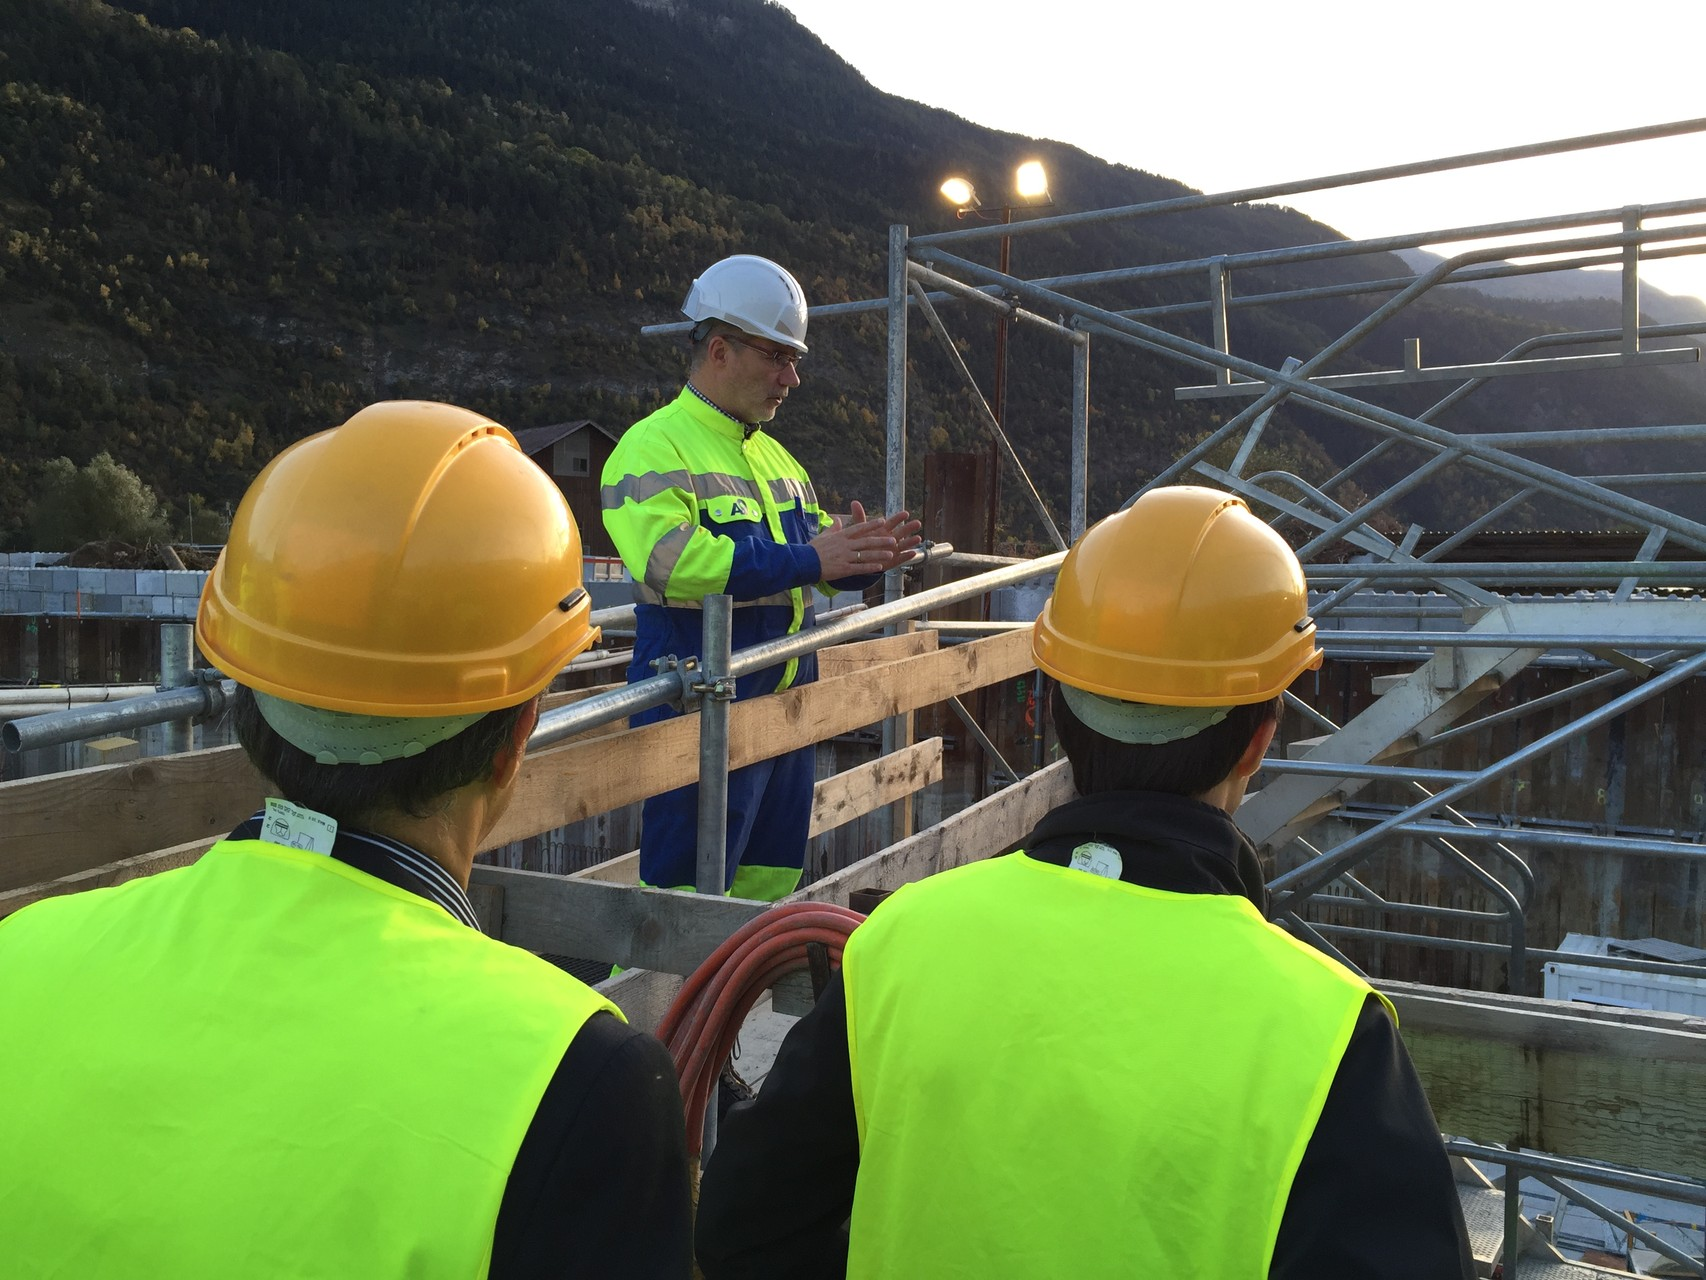 A9, Besuch der Baustellen in Visp, 8. Oktober 2015